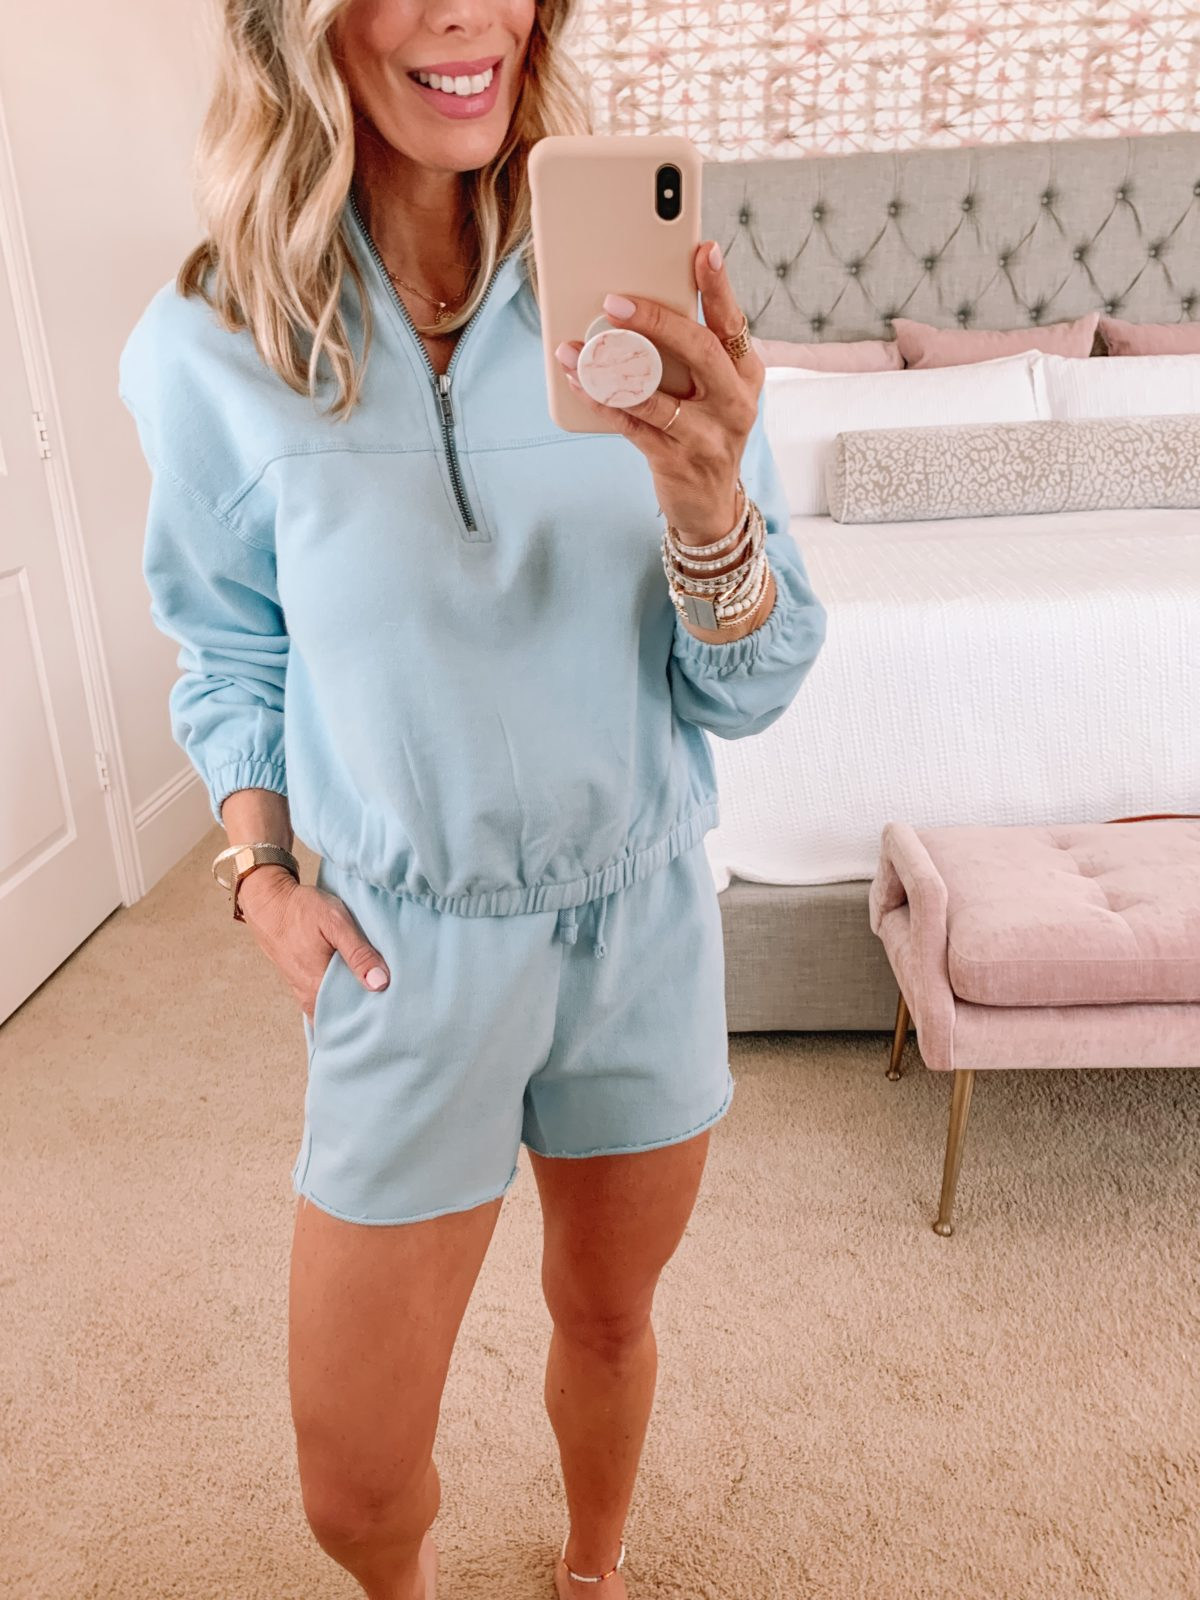 Dressing Room Finds, Sweatshirt, Shorts